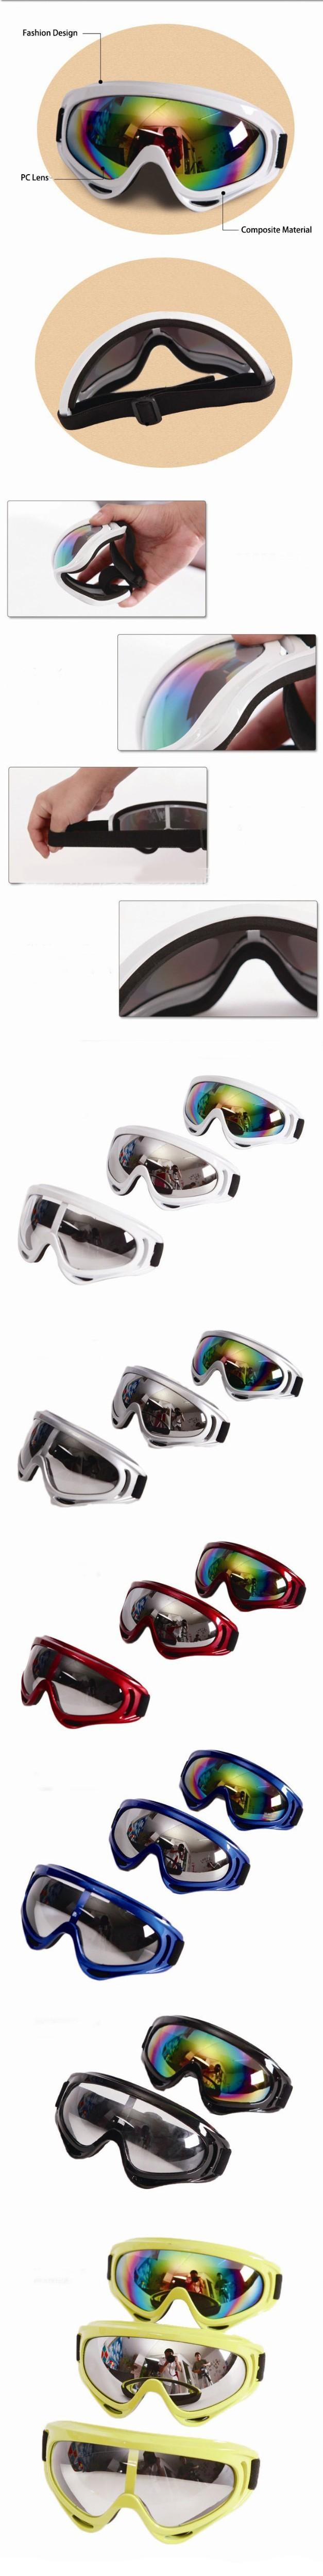 2014 New Men Women Tactical Outdoor RidingWindproof Ski Snowboard